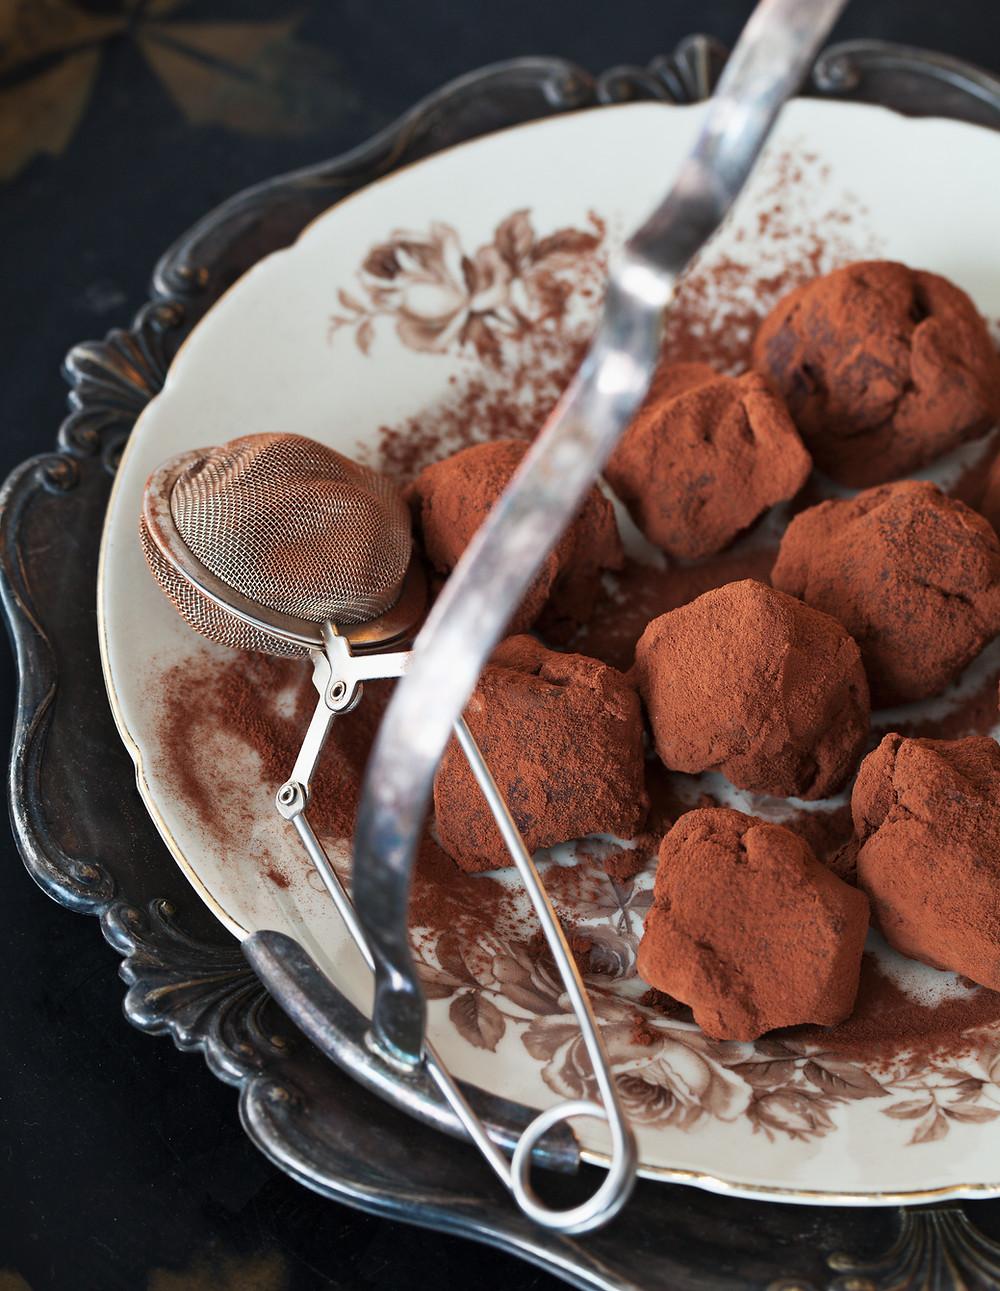 Dusting Chocolate Truffles